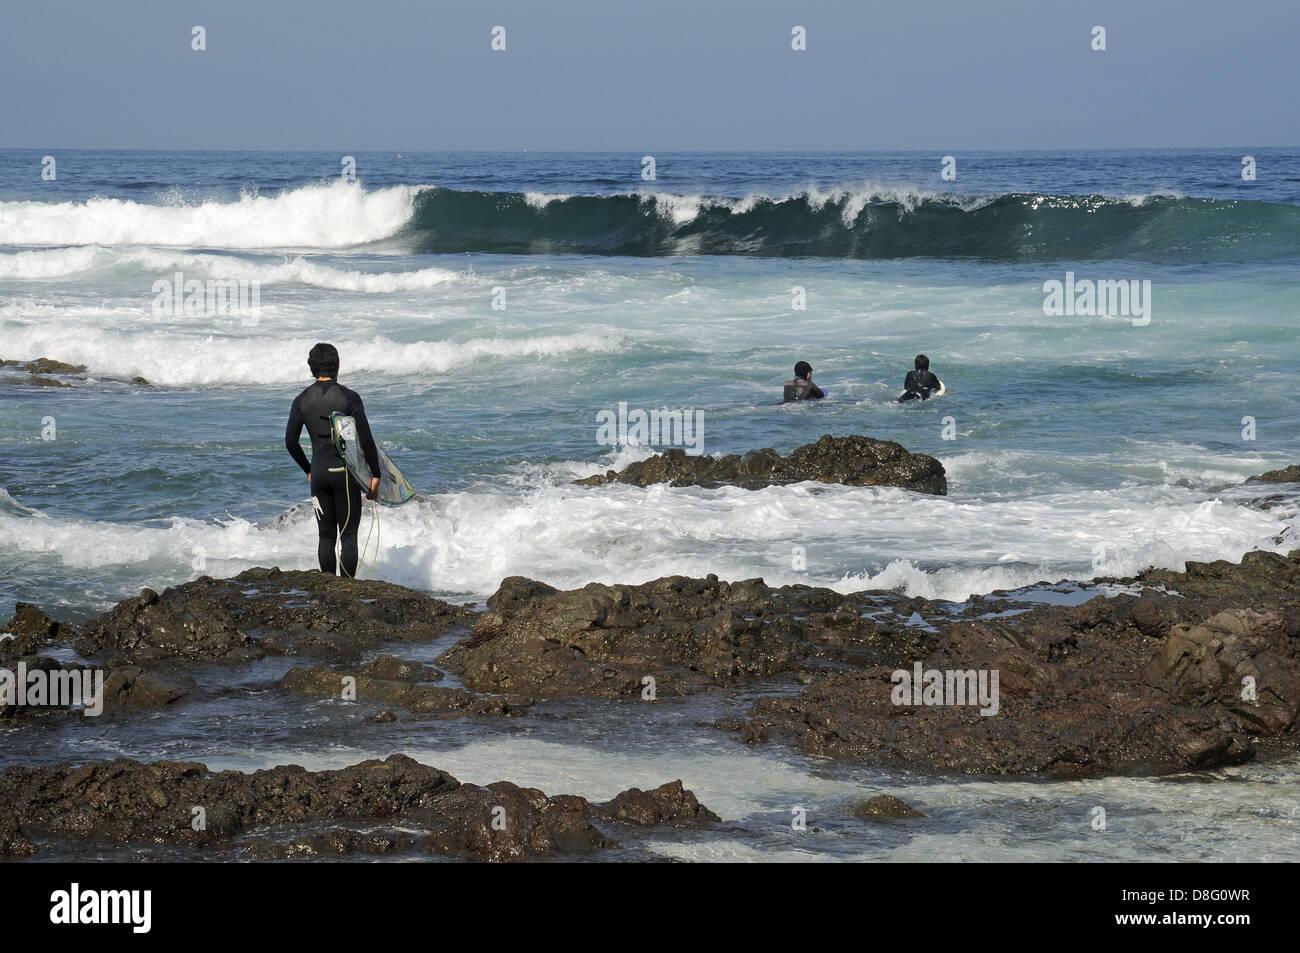 surfer - Stock Image